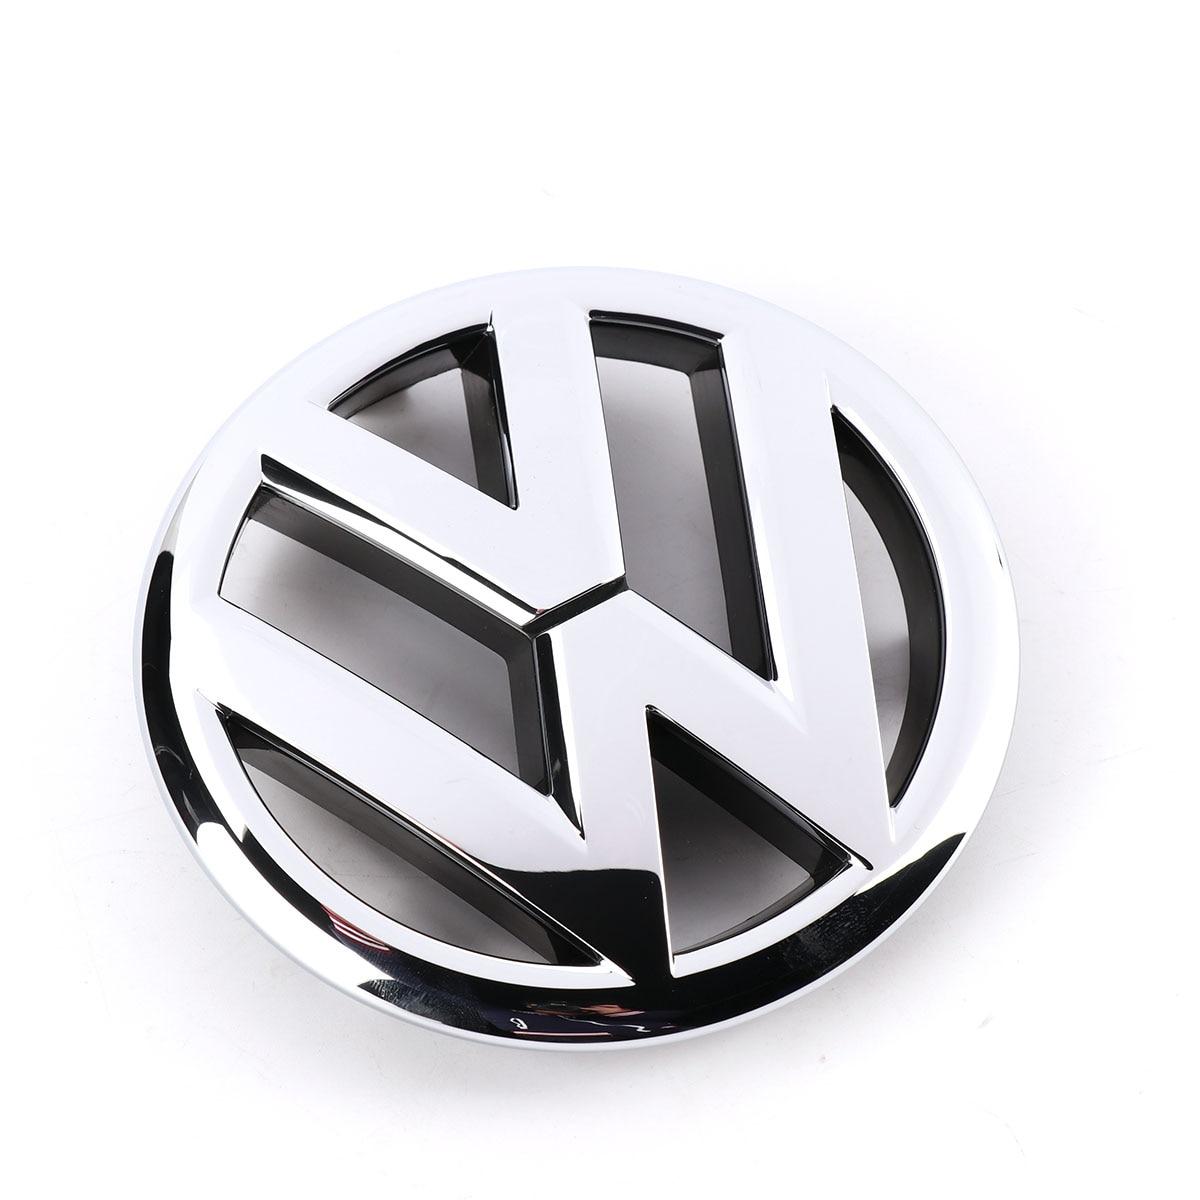 Car Auto VW Emblem Chrome OEM Front Grille Badge Sticker For Volkswagen Jetta MK6 Sedan 2011-2015 5C6853601ULM